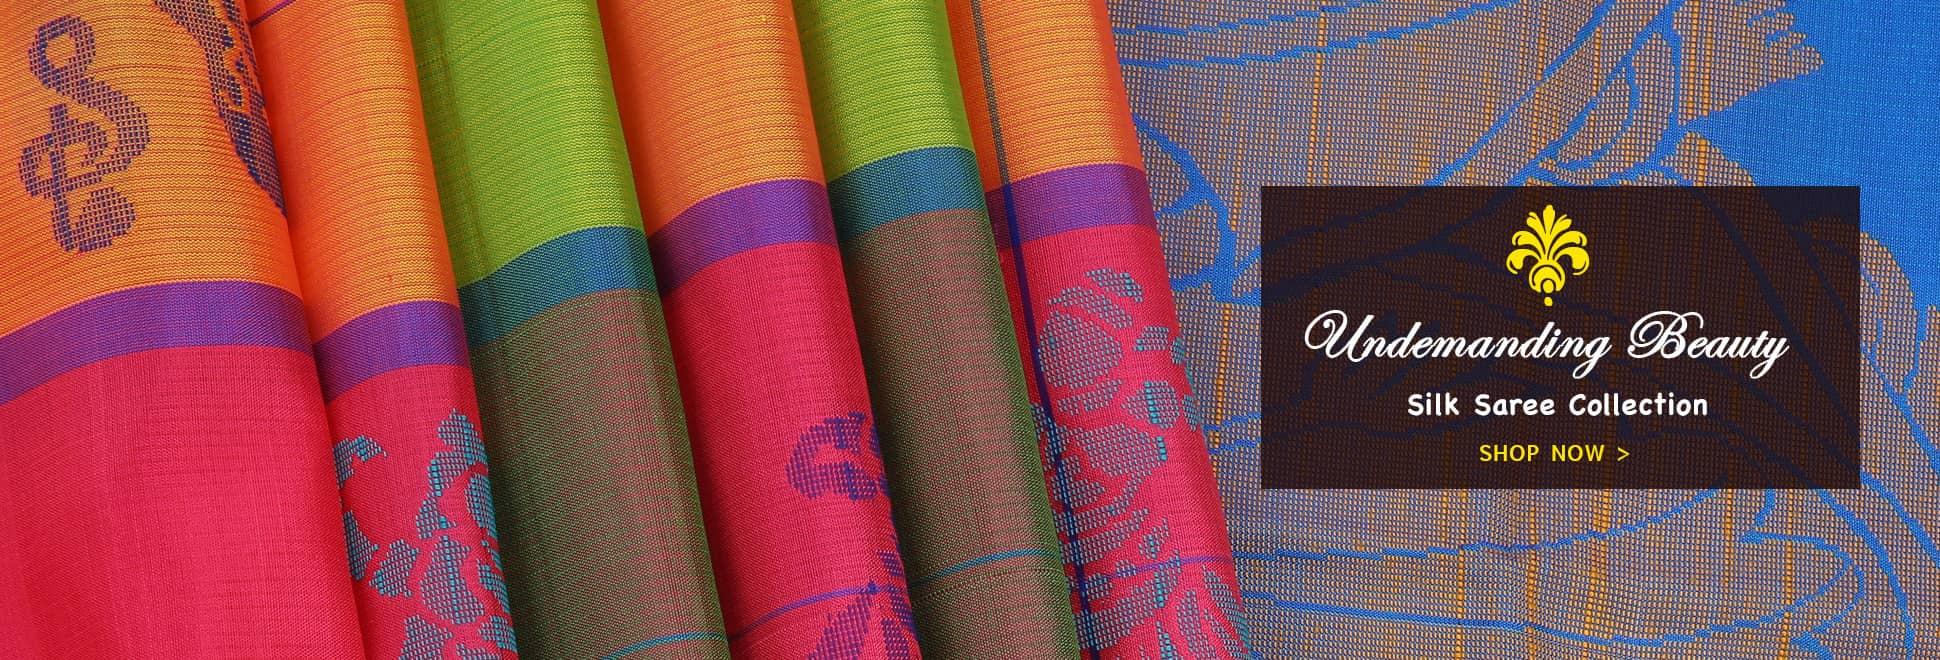 Silk Sarees- Buy Pure Silk and Soft Silk Sarees at The